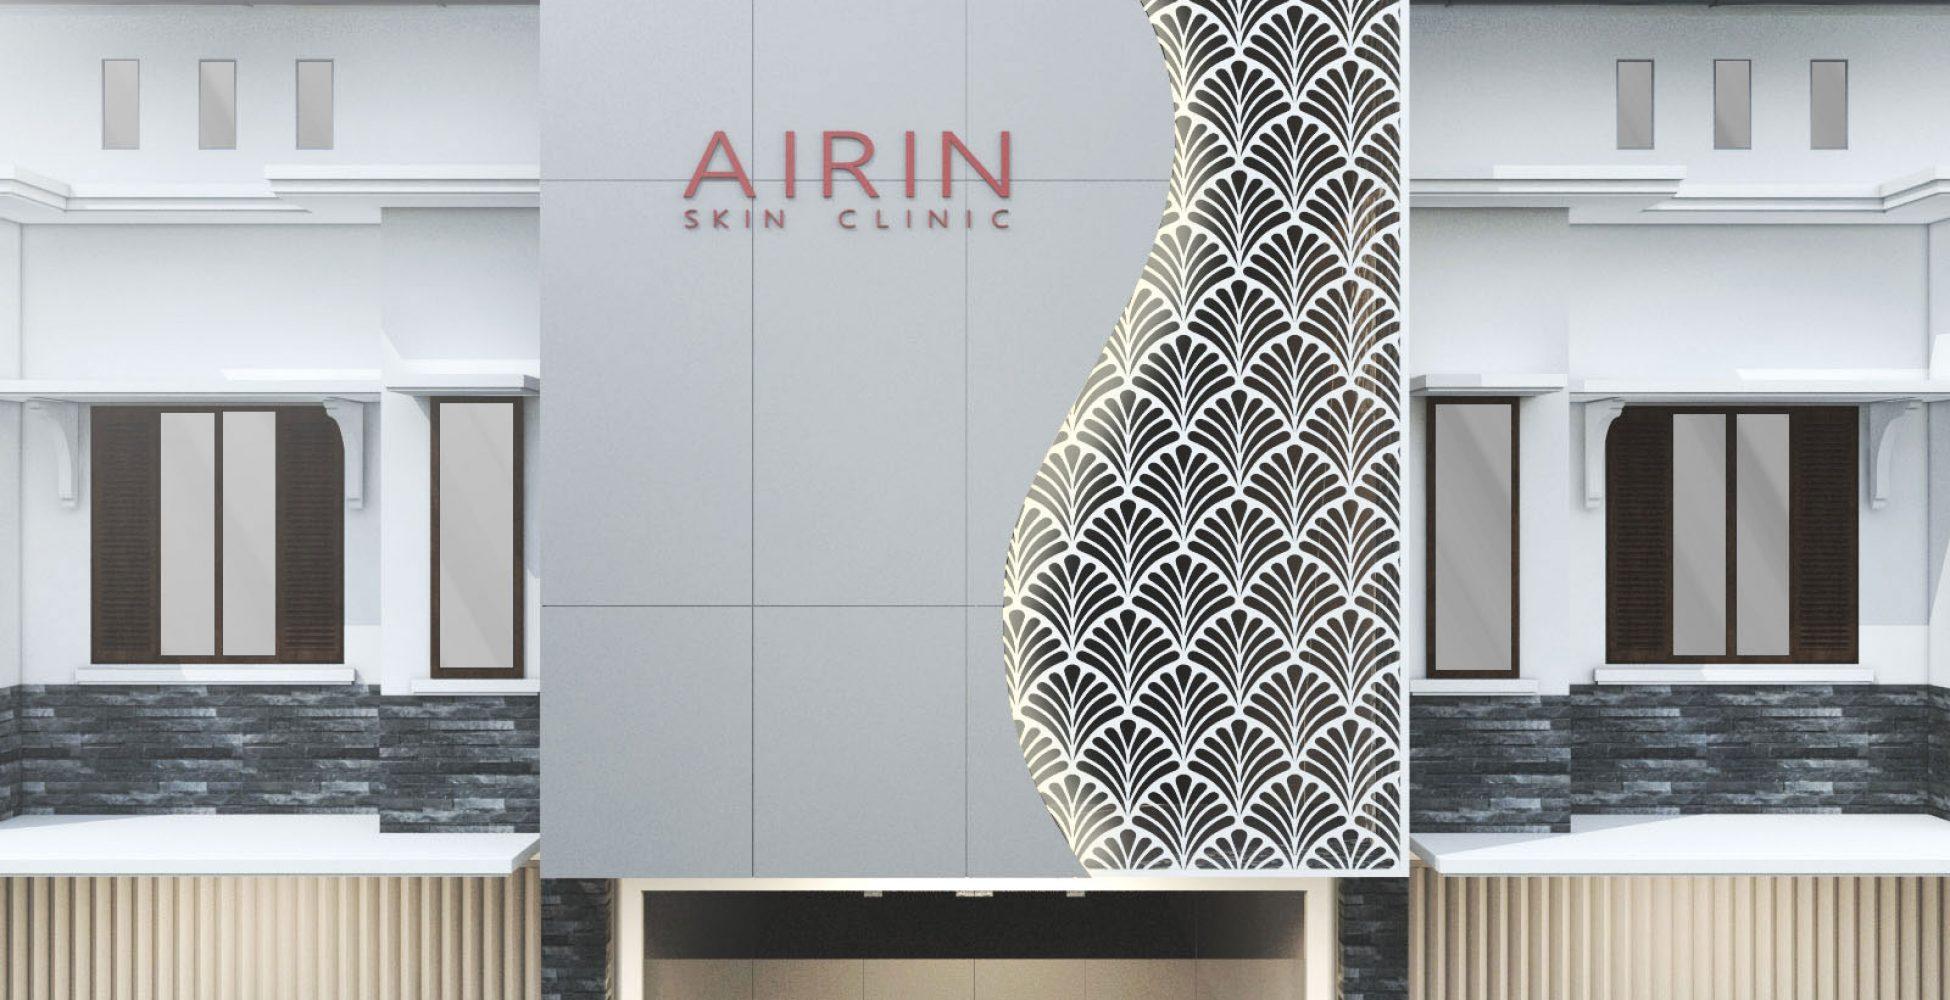 Klinik-Airin-1